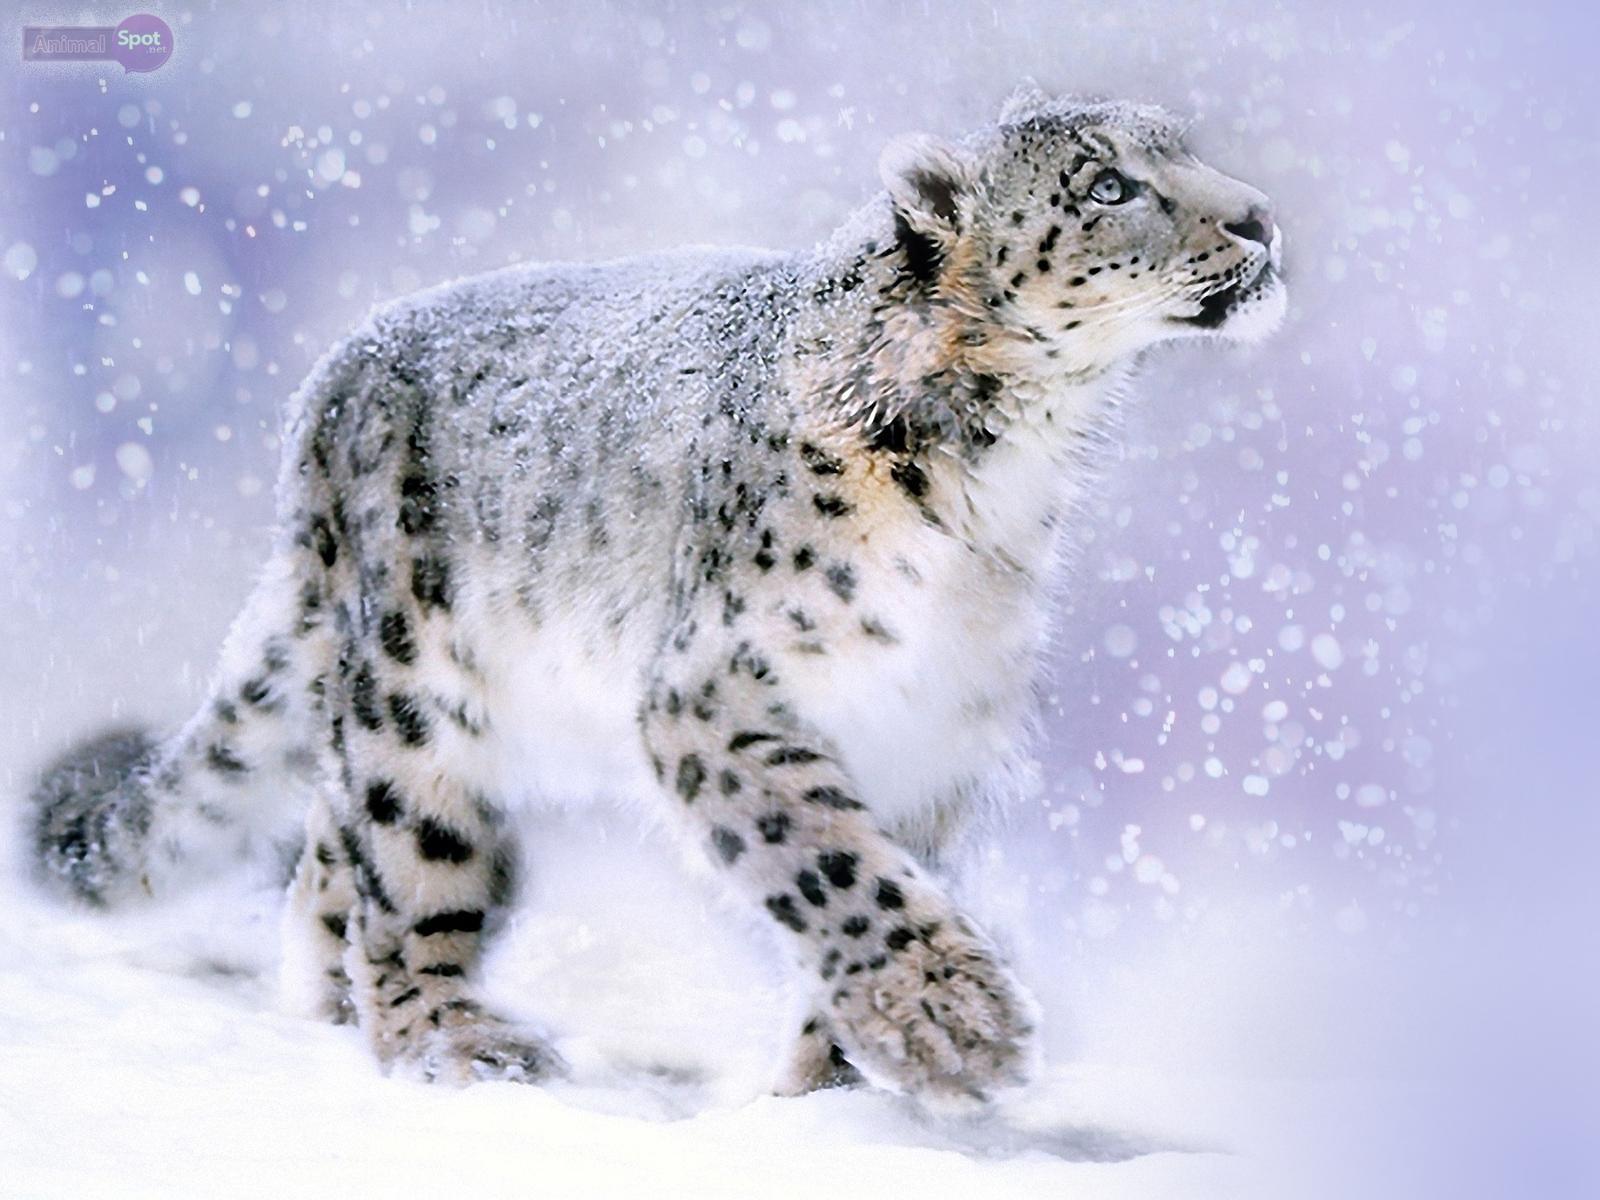 Simple Wallpaper Mac Snow Leopard - Snow-Leopard-Wallpaper-037  2018_475474.jpg